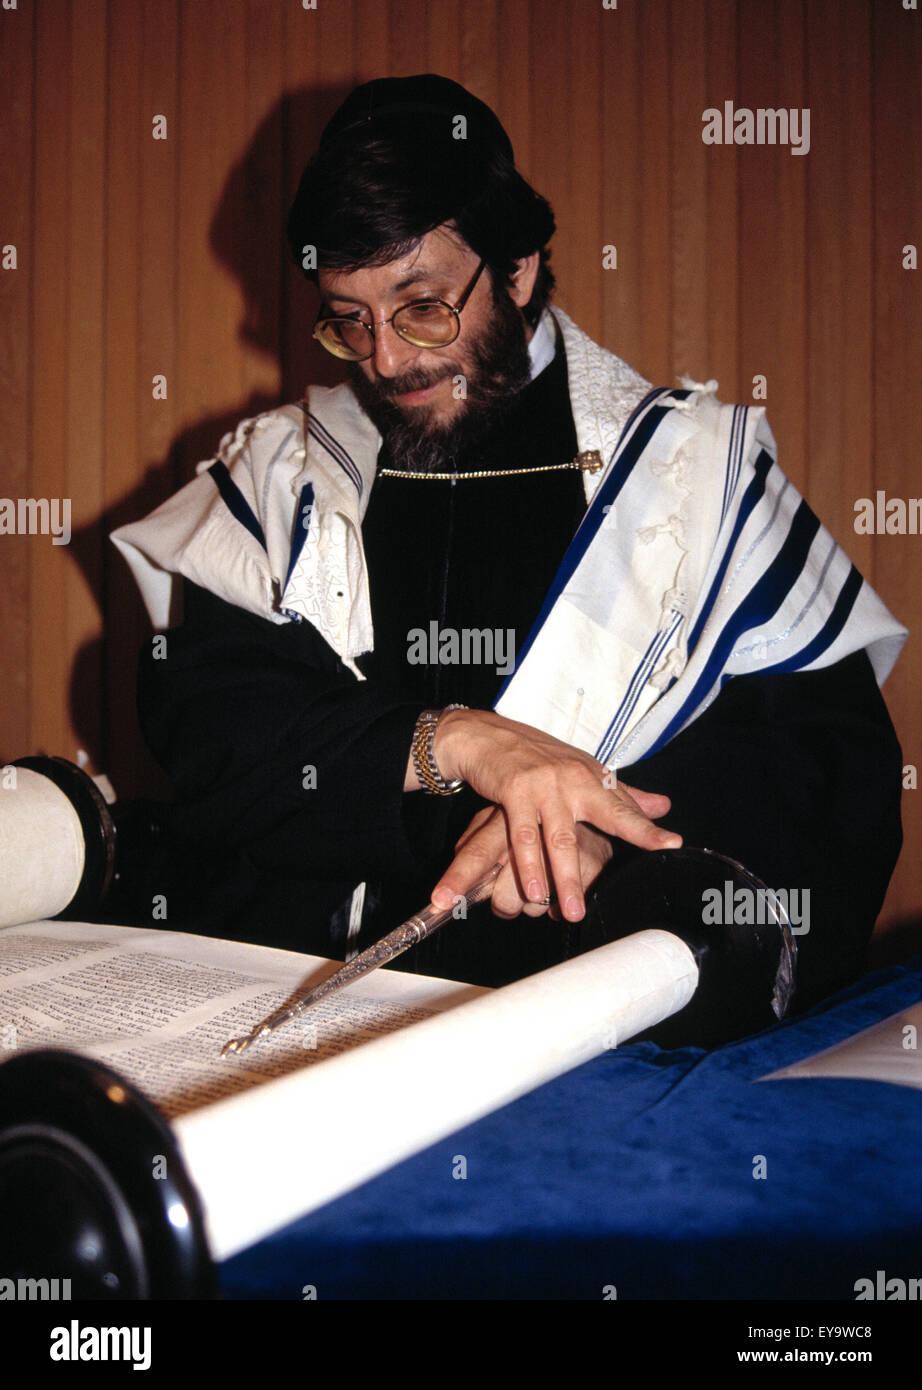 Rabbi Neil Kraft in a Reform synagogue, reading the torah scrolls - Stock Image